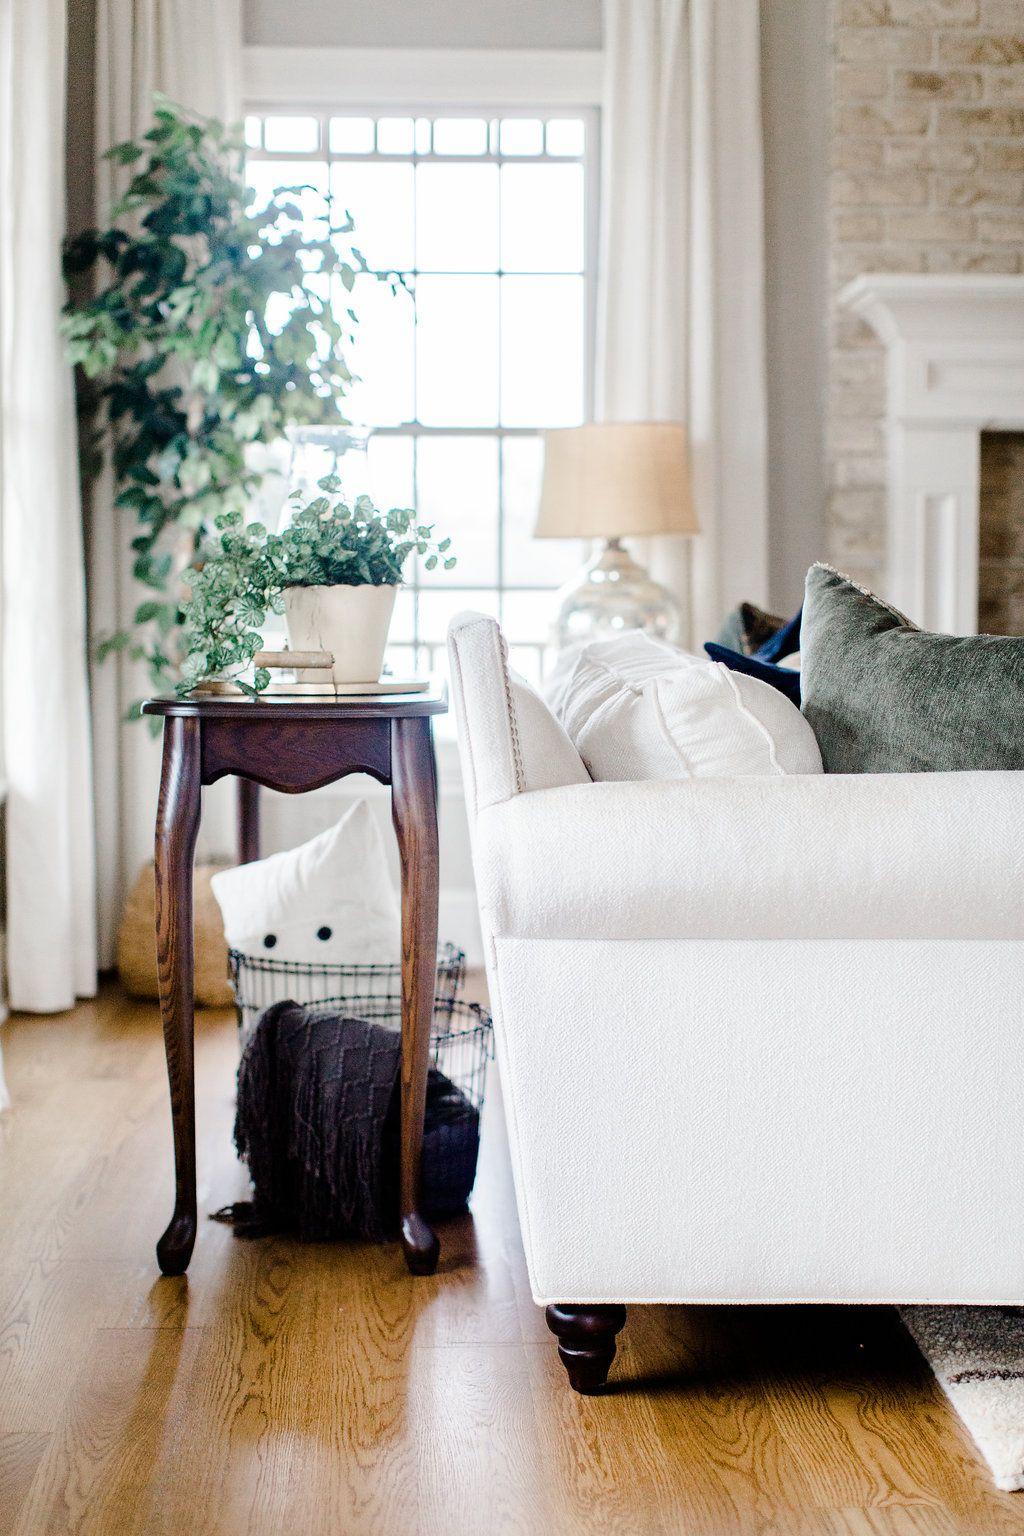 A Cozy Winter Refresh by Michaela Noelle Designs | Rue | H O M E ...